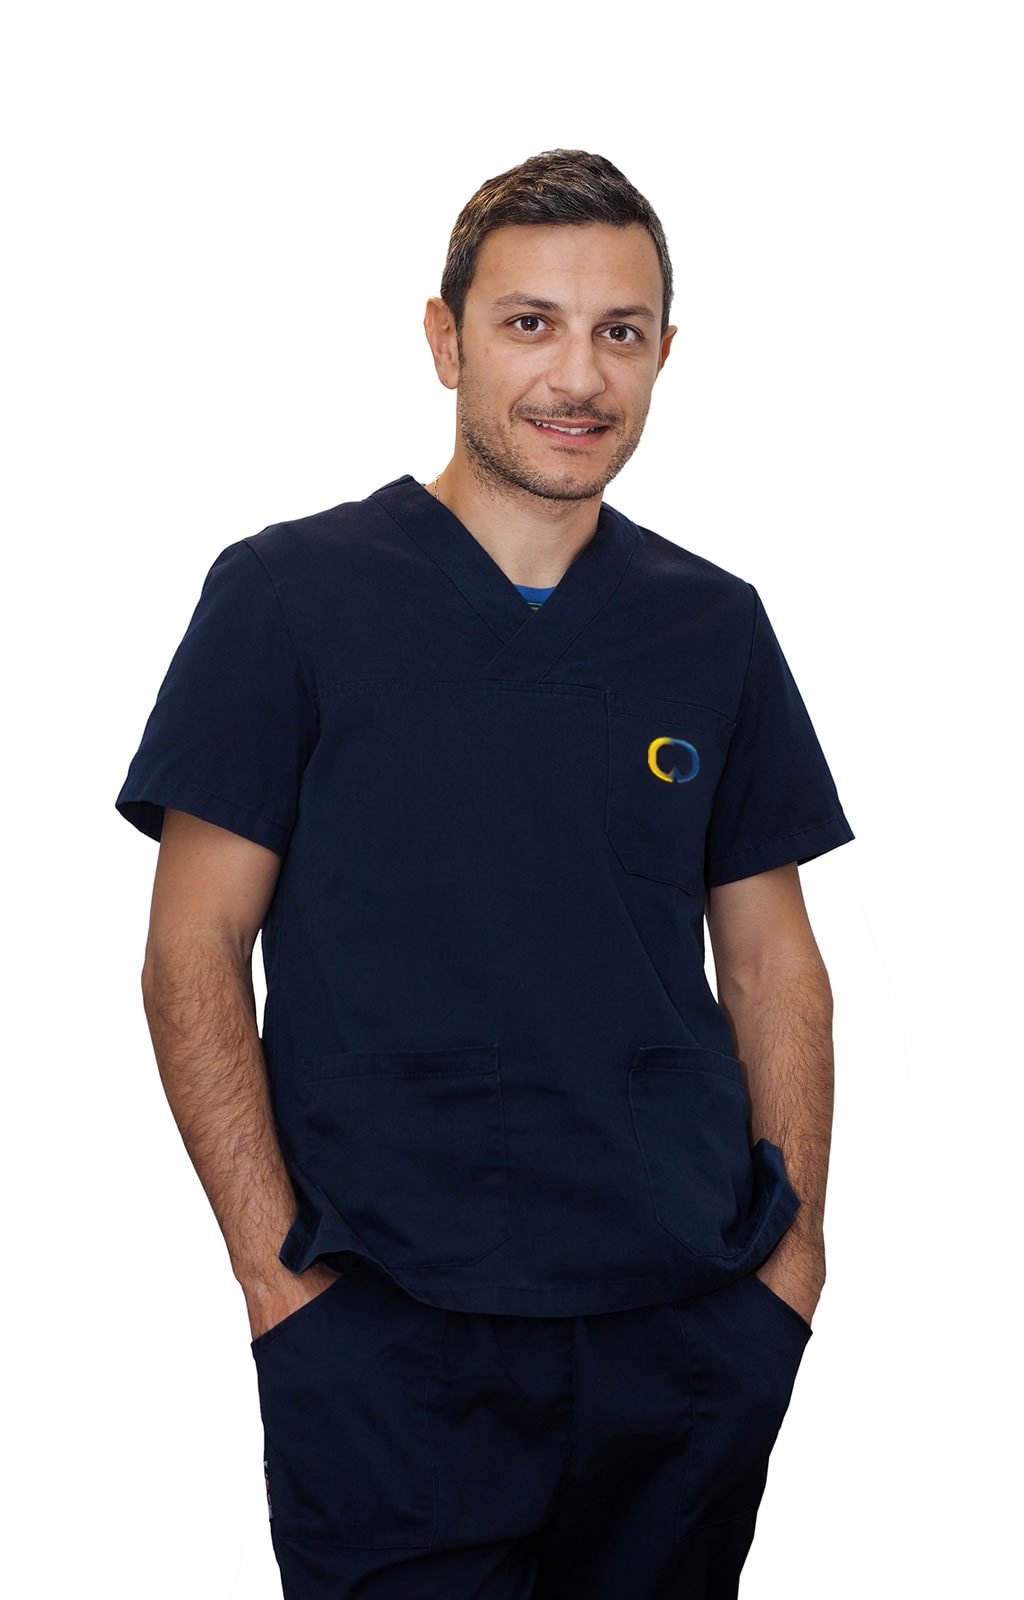 Dott. Capriotti Marco